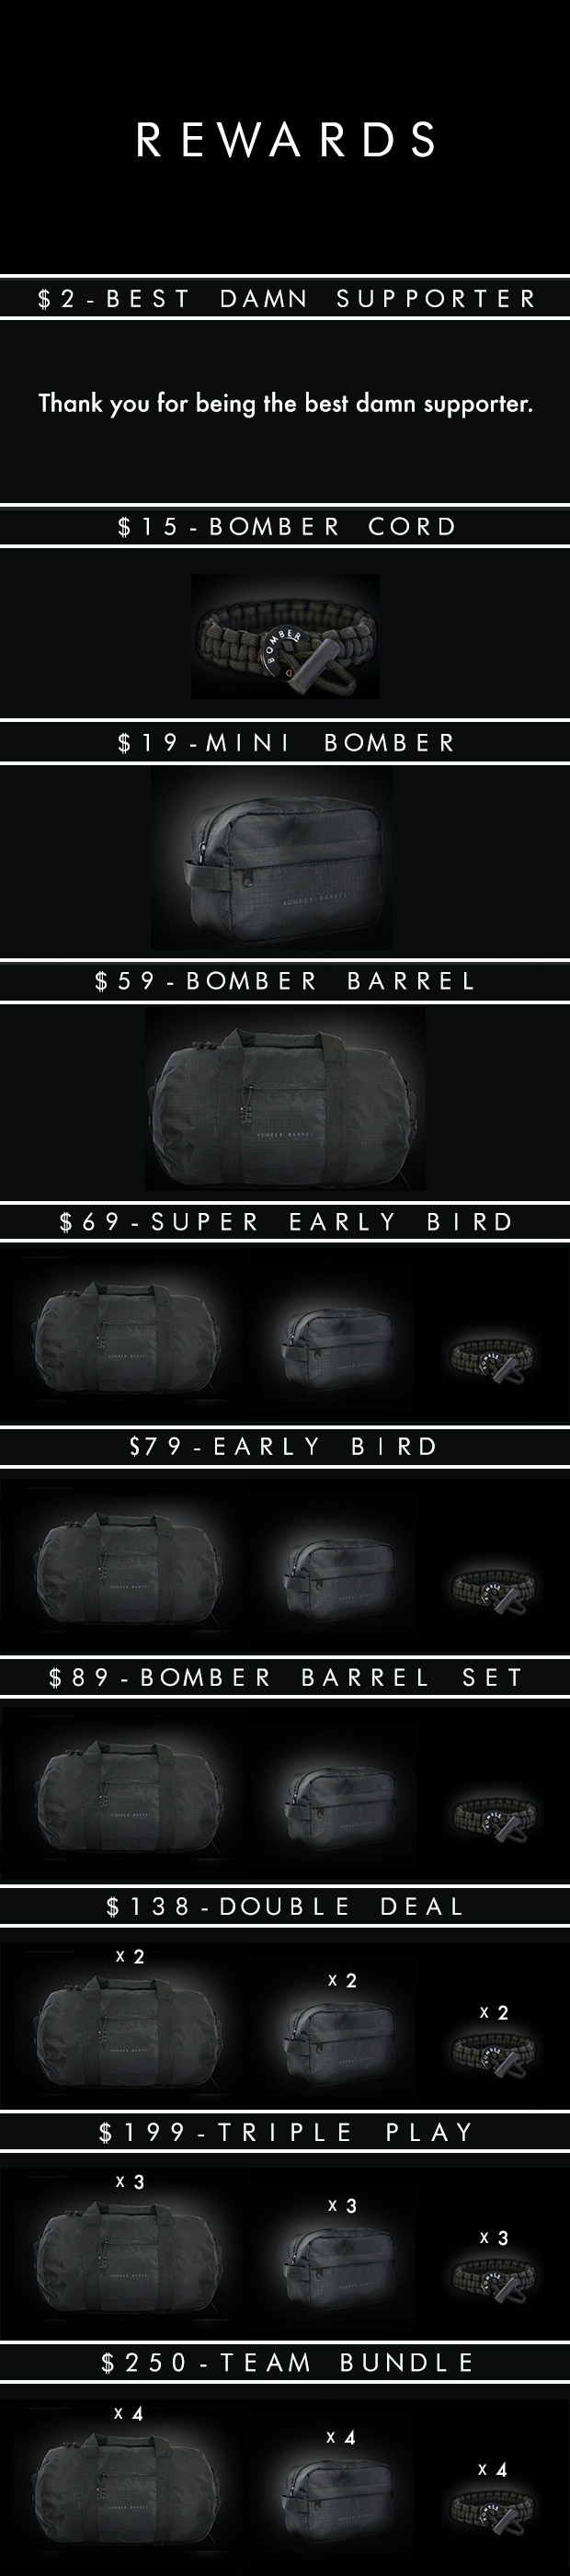 Bomber Barrel - Rewards